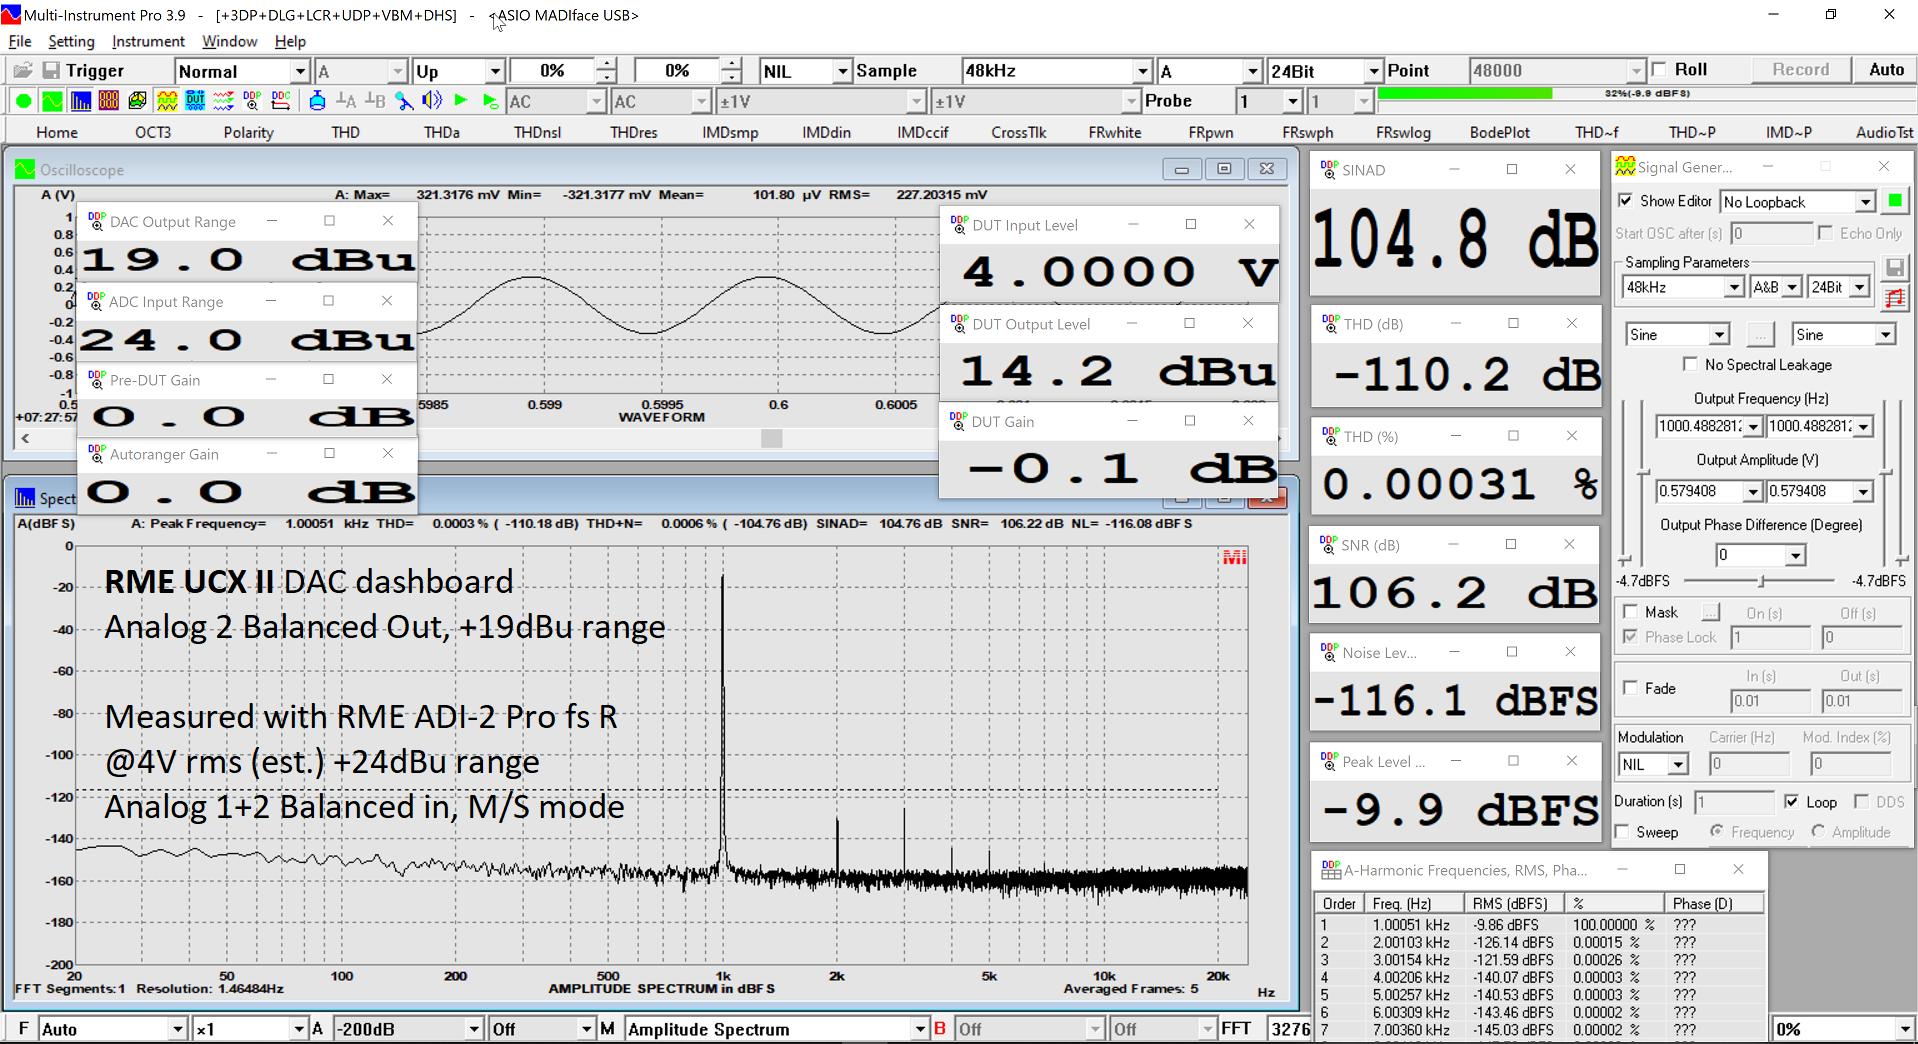 RME UCX II DAC Dashboard 3.png